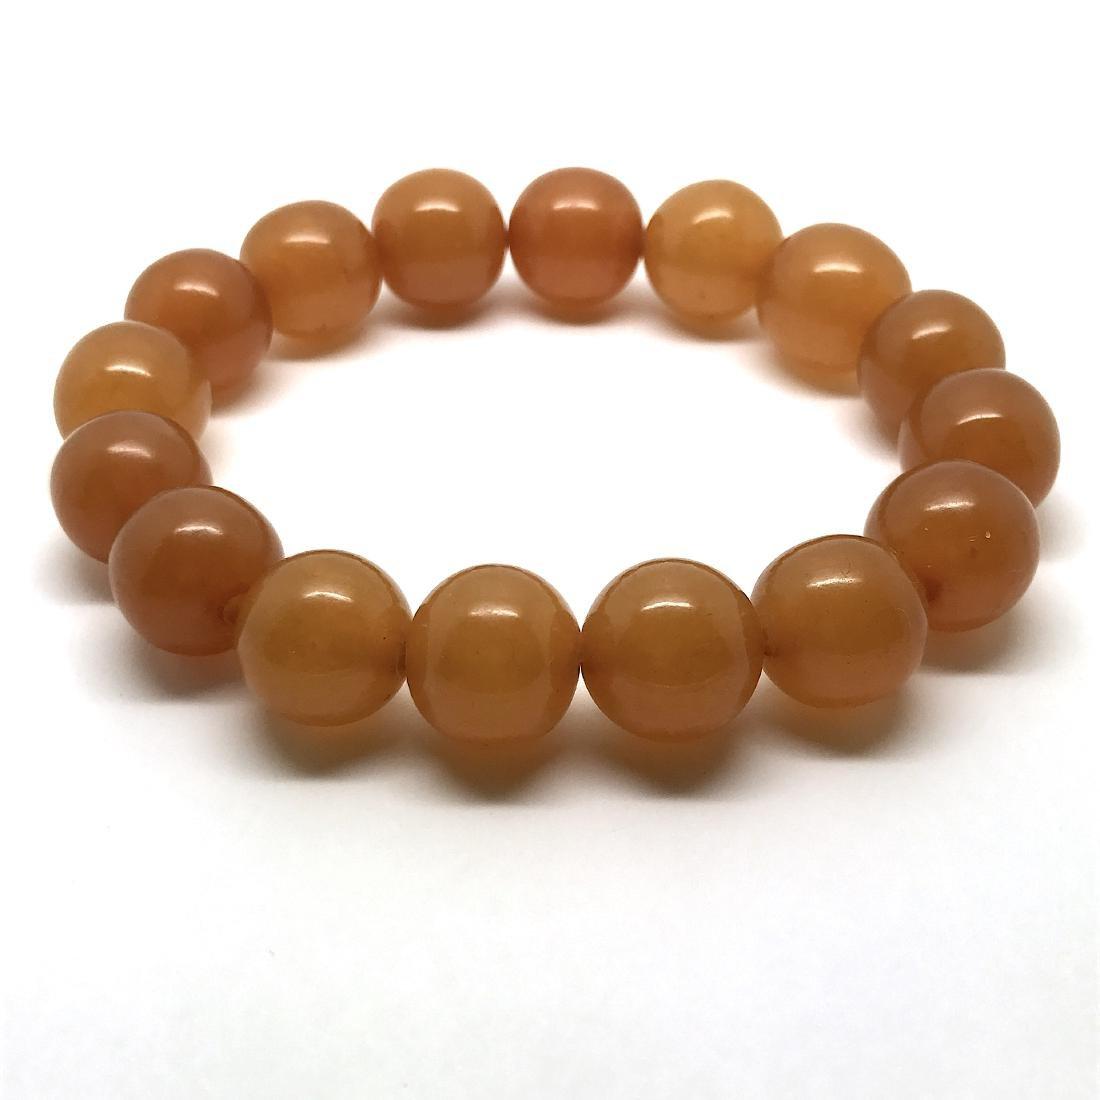 Antique Baltic amber beads bracelet 21.5 gr - 3